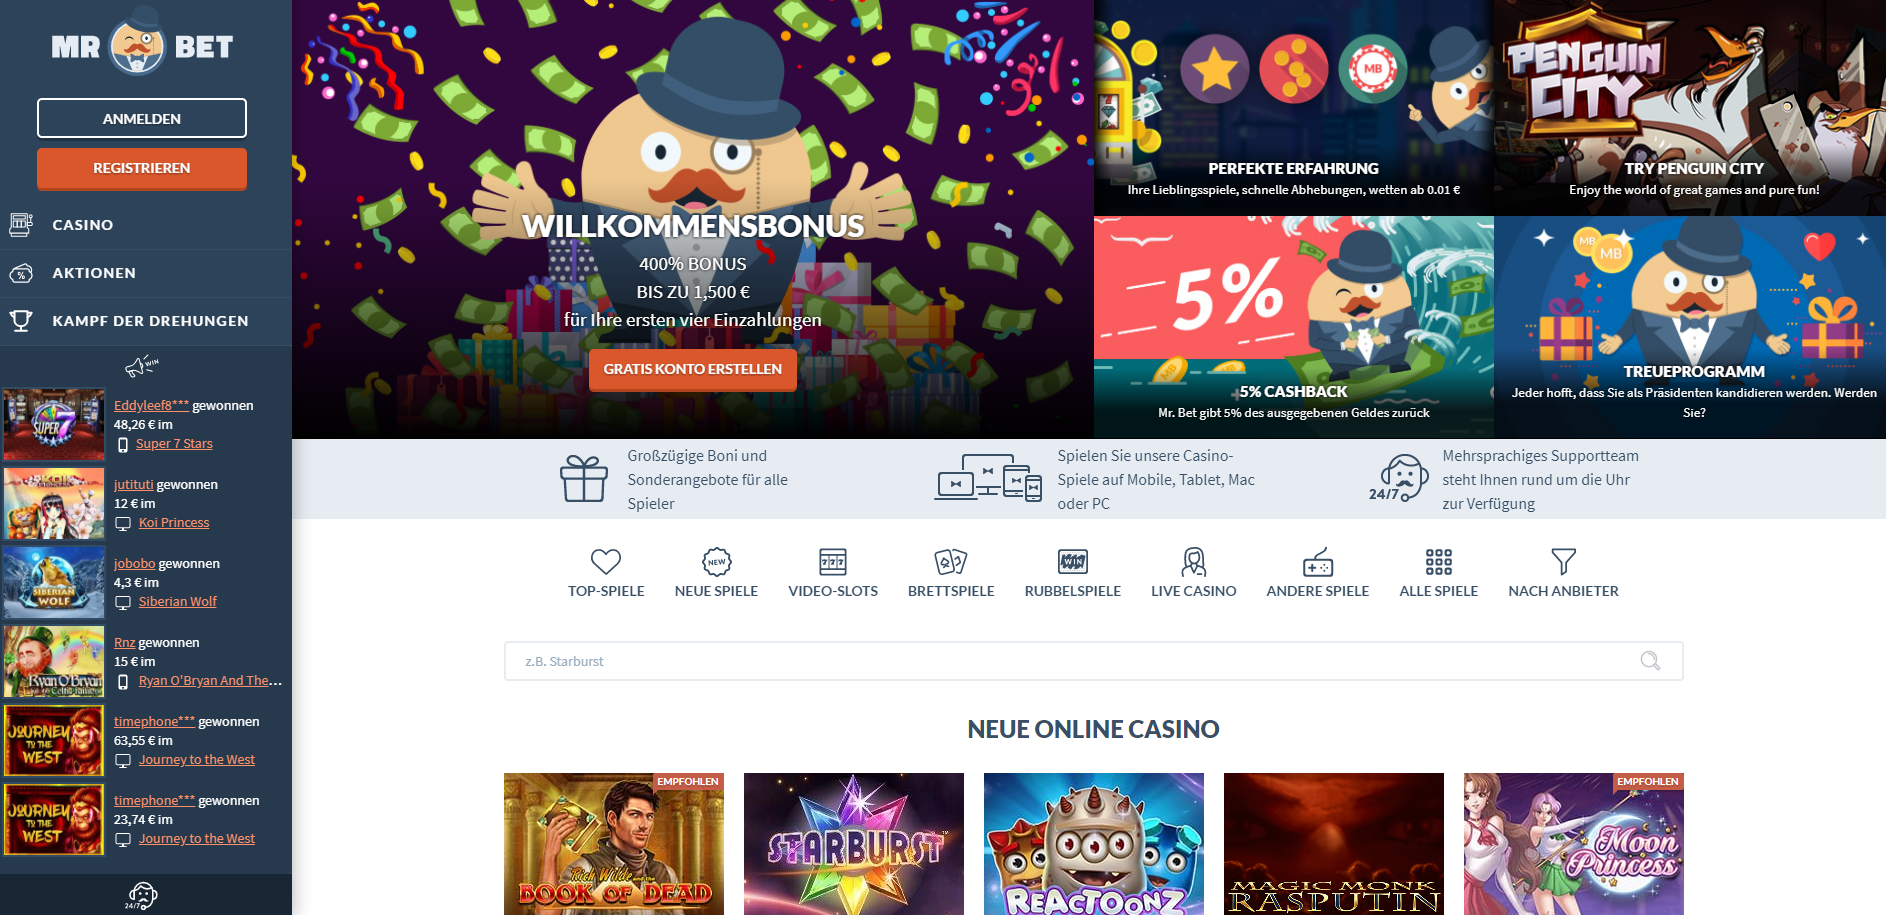 Online Casino Seriös